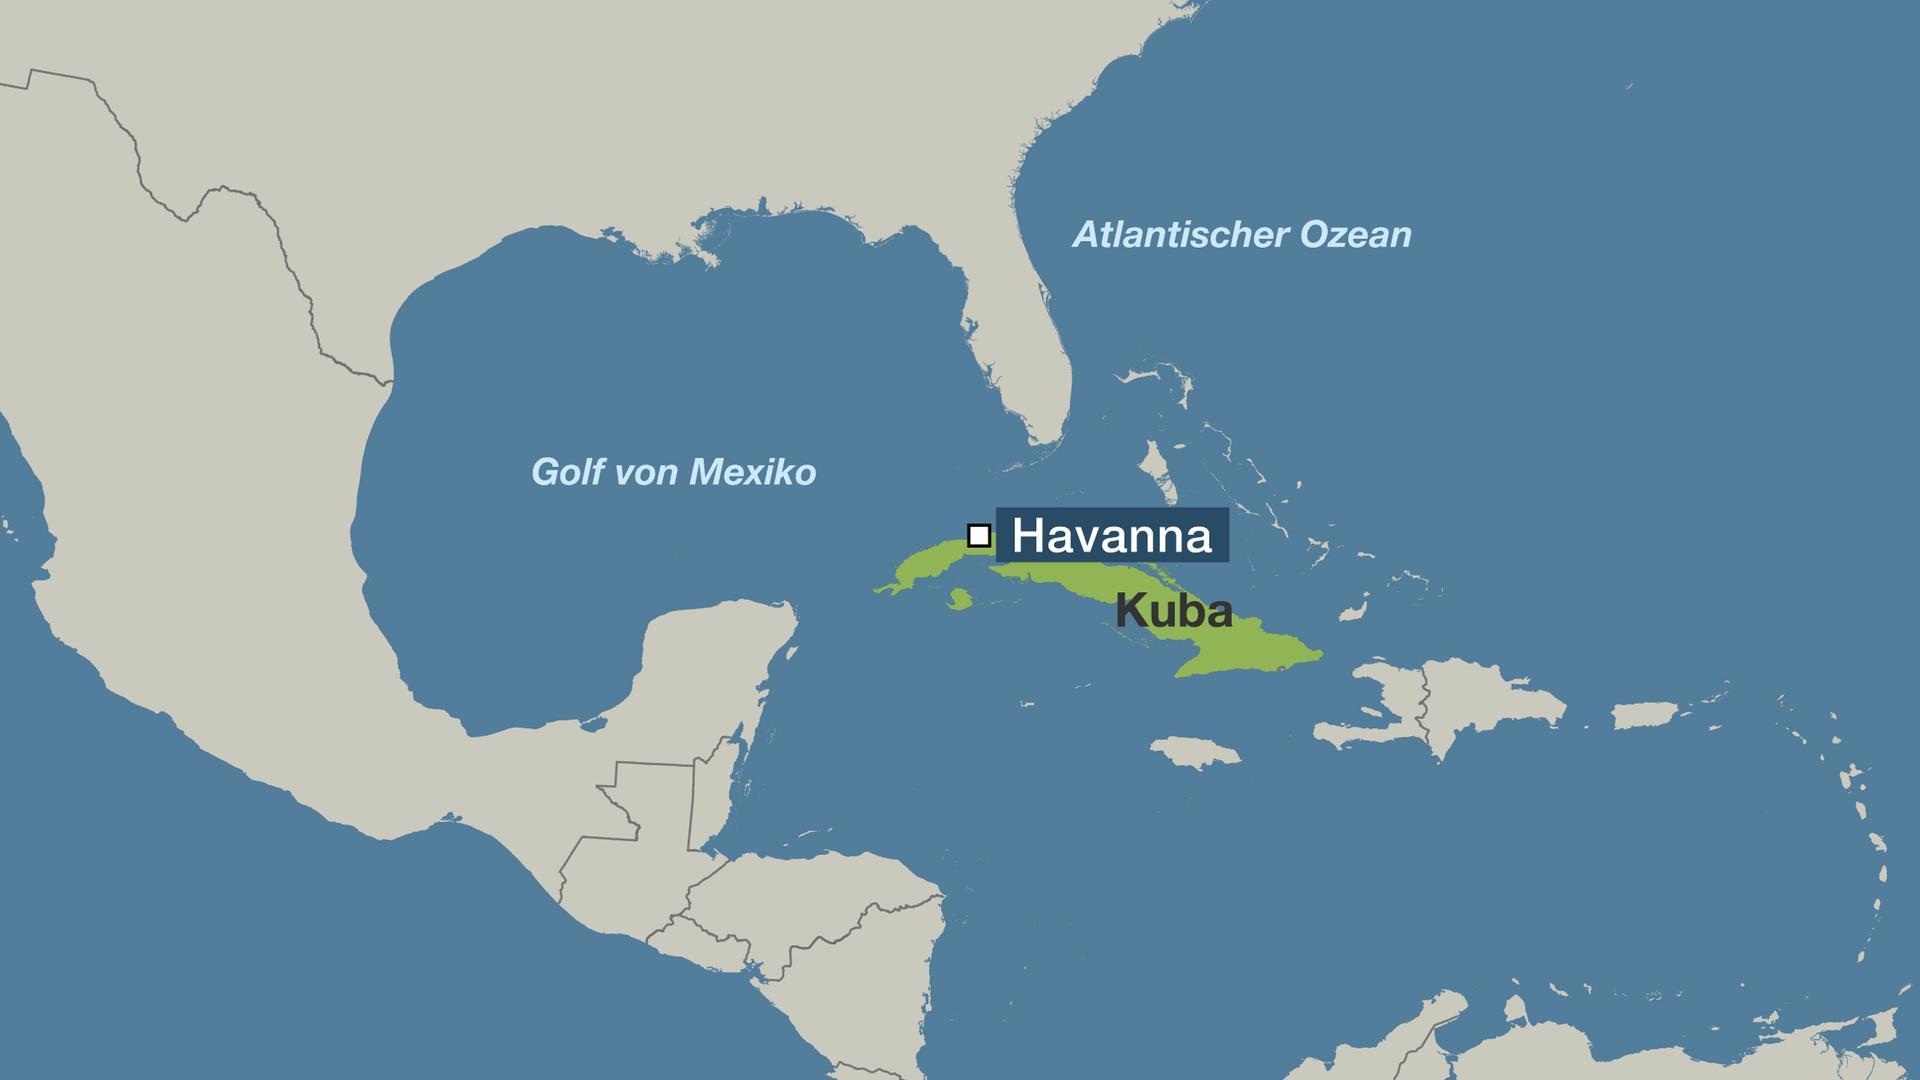 Havanna Kuba Karte.Blitz Und Lauter Knall Meteorit Geht Auf Kuba Nieder Zdfmediathek